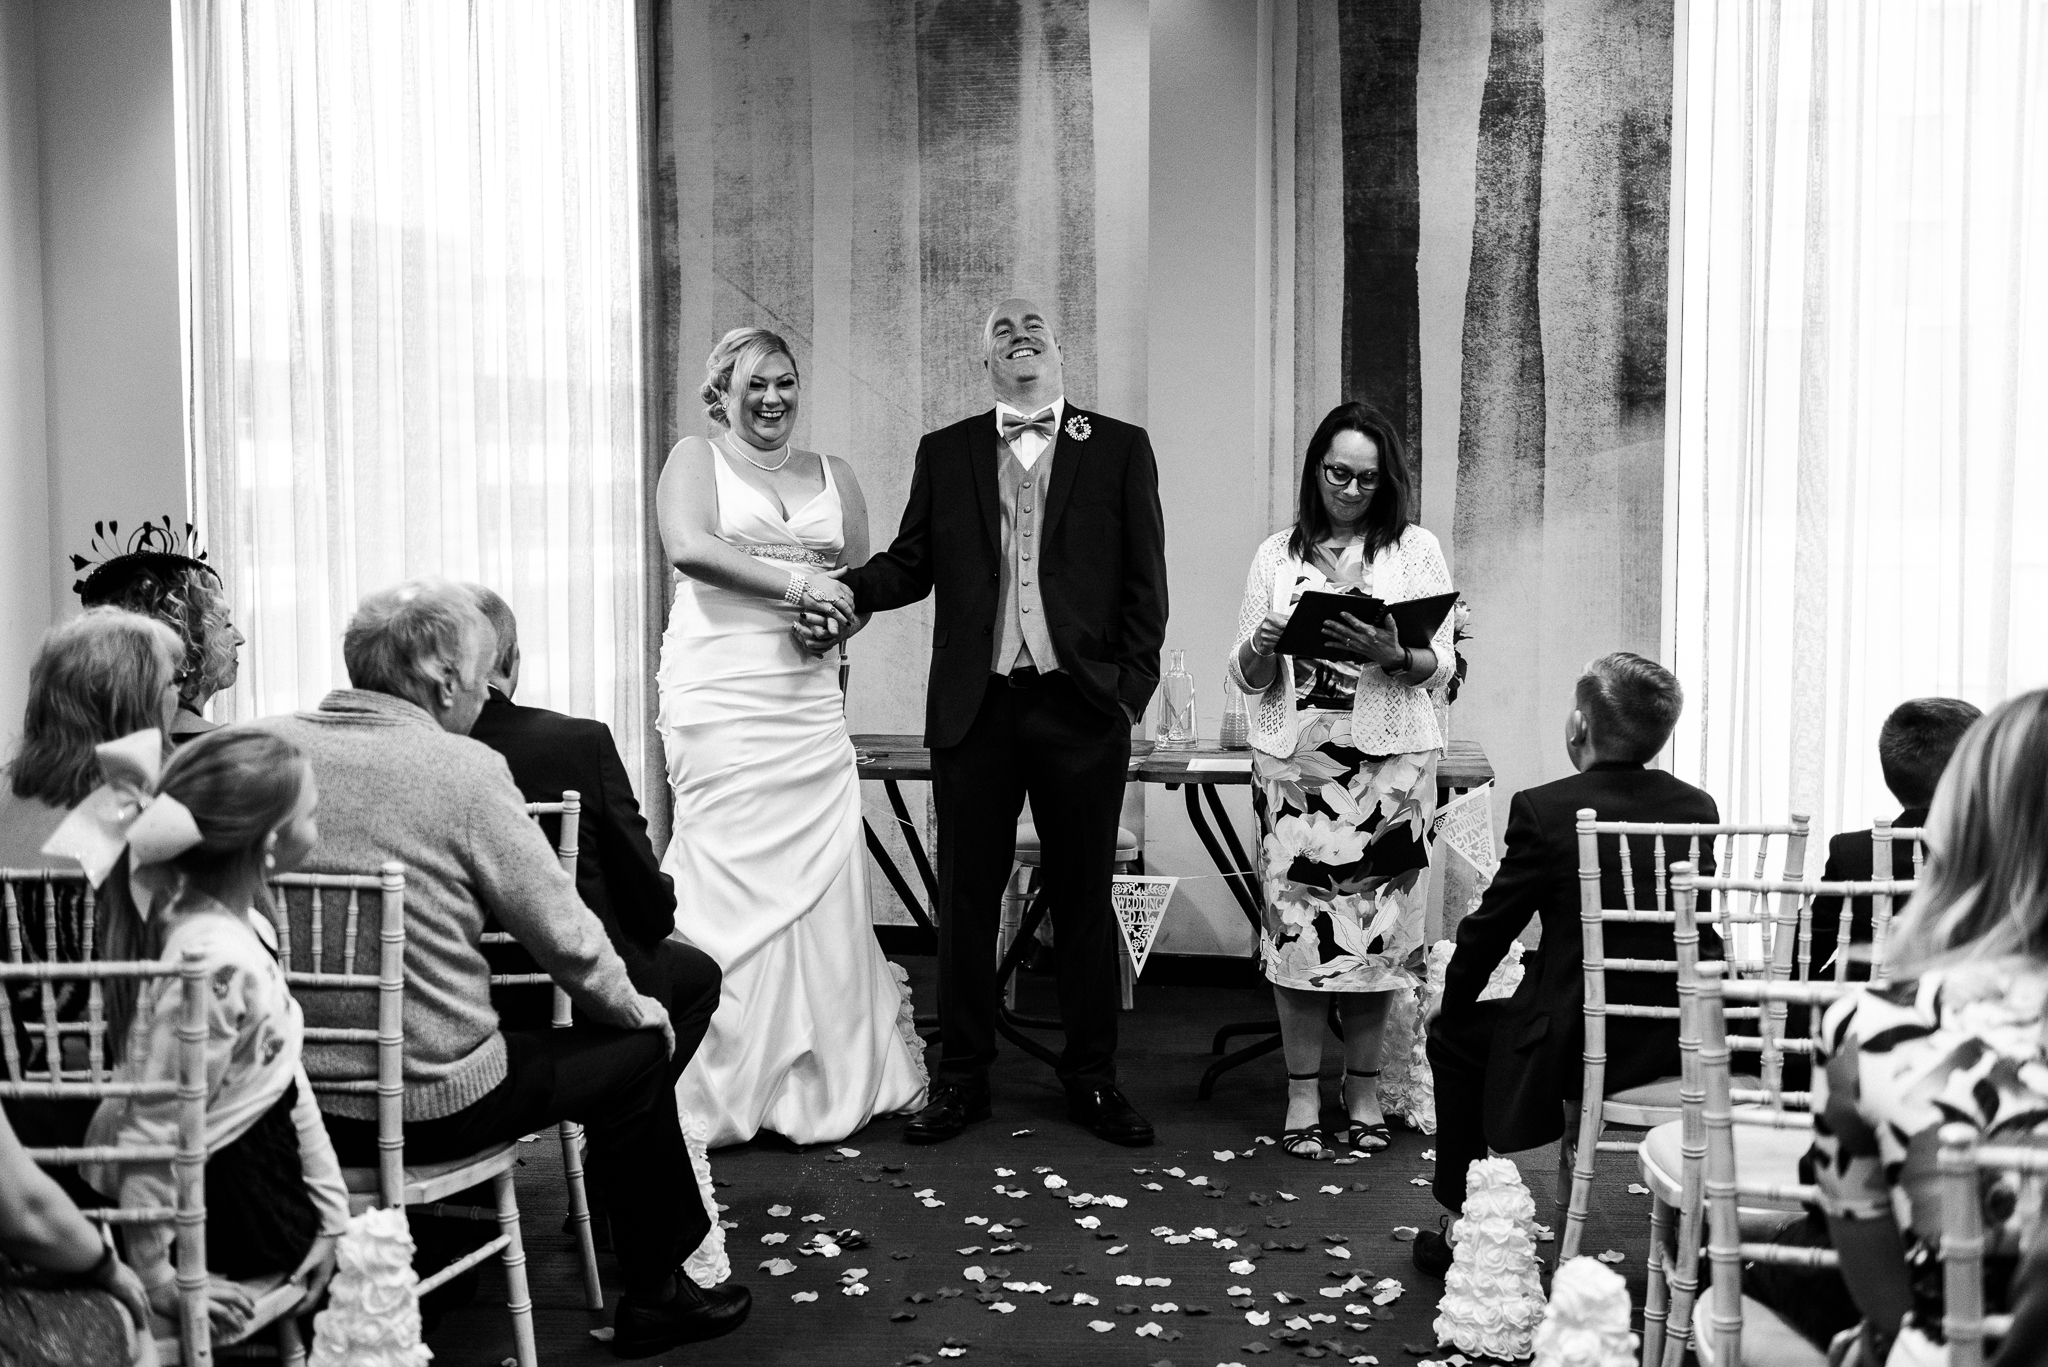 Manchester Wedding Photography On the 7th Media City UK, Salford 20s Art Deco Feathers Urban - Jenny Harper-20.jpg